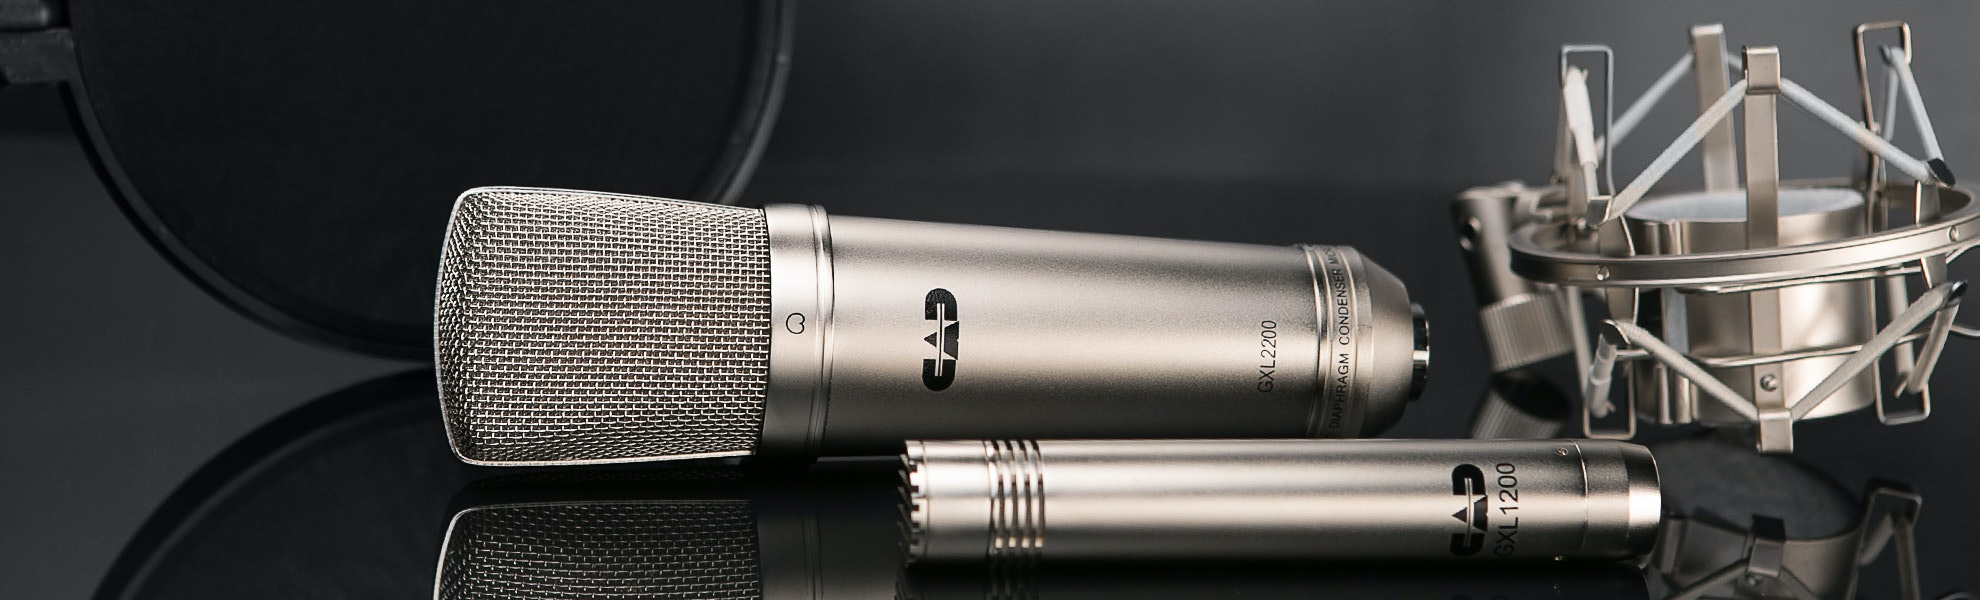 CAD GXL2200SSP 3 Microphone Studio Pack